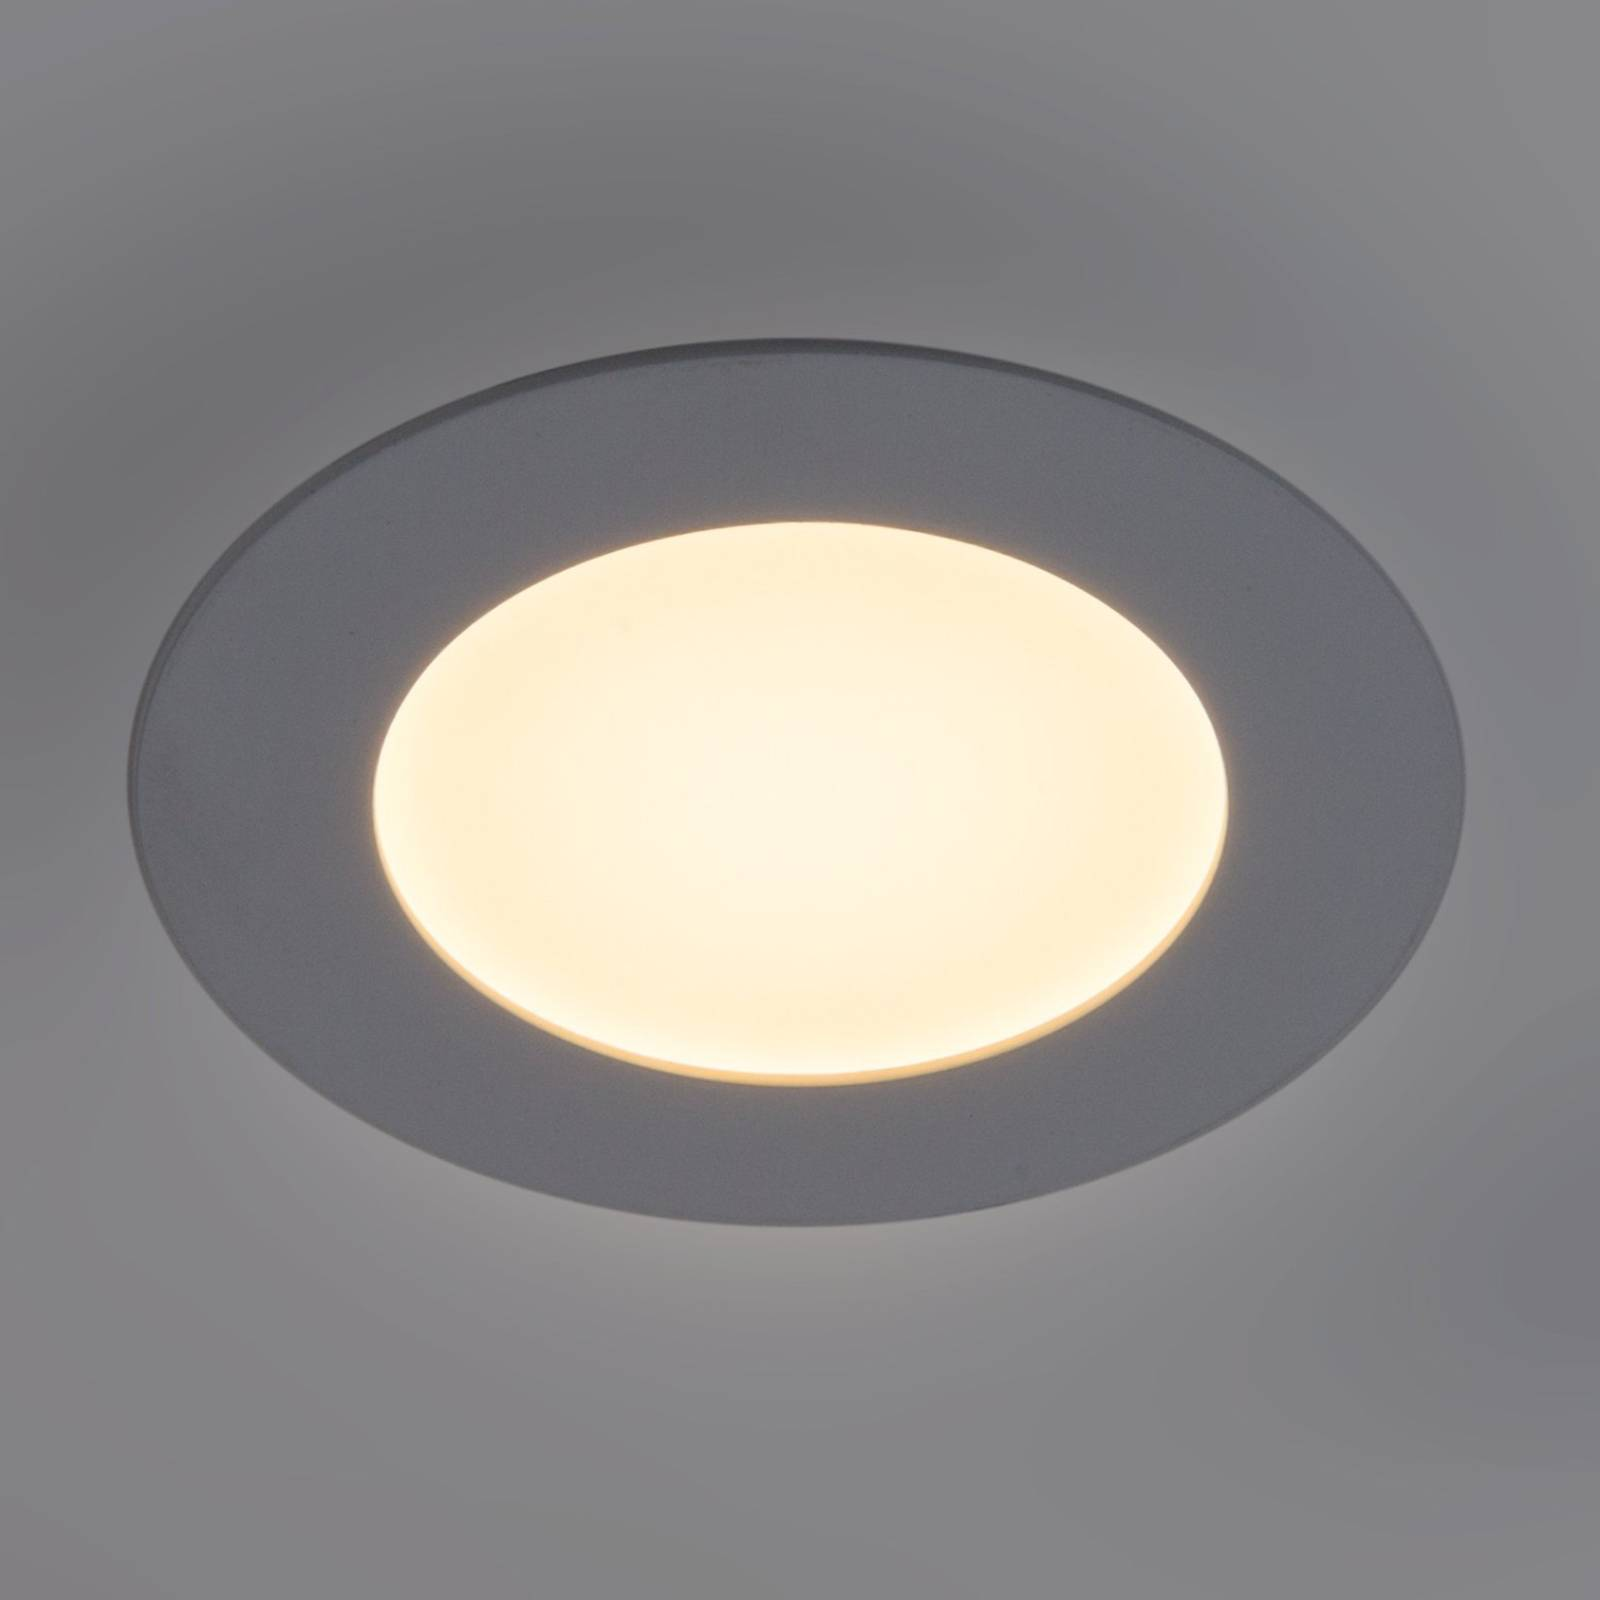 LED paneel Lyon rond Ø 12 cm dimbaar